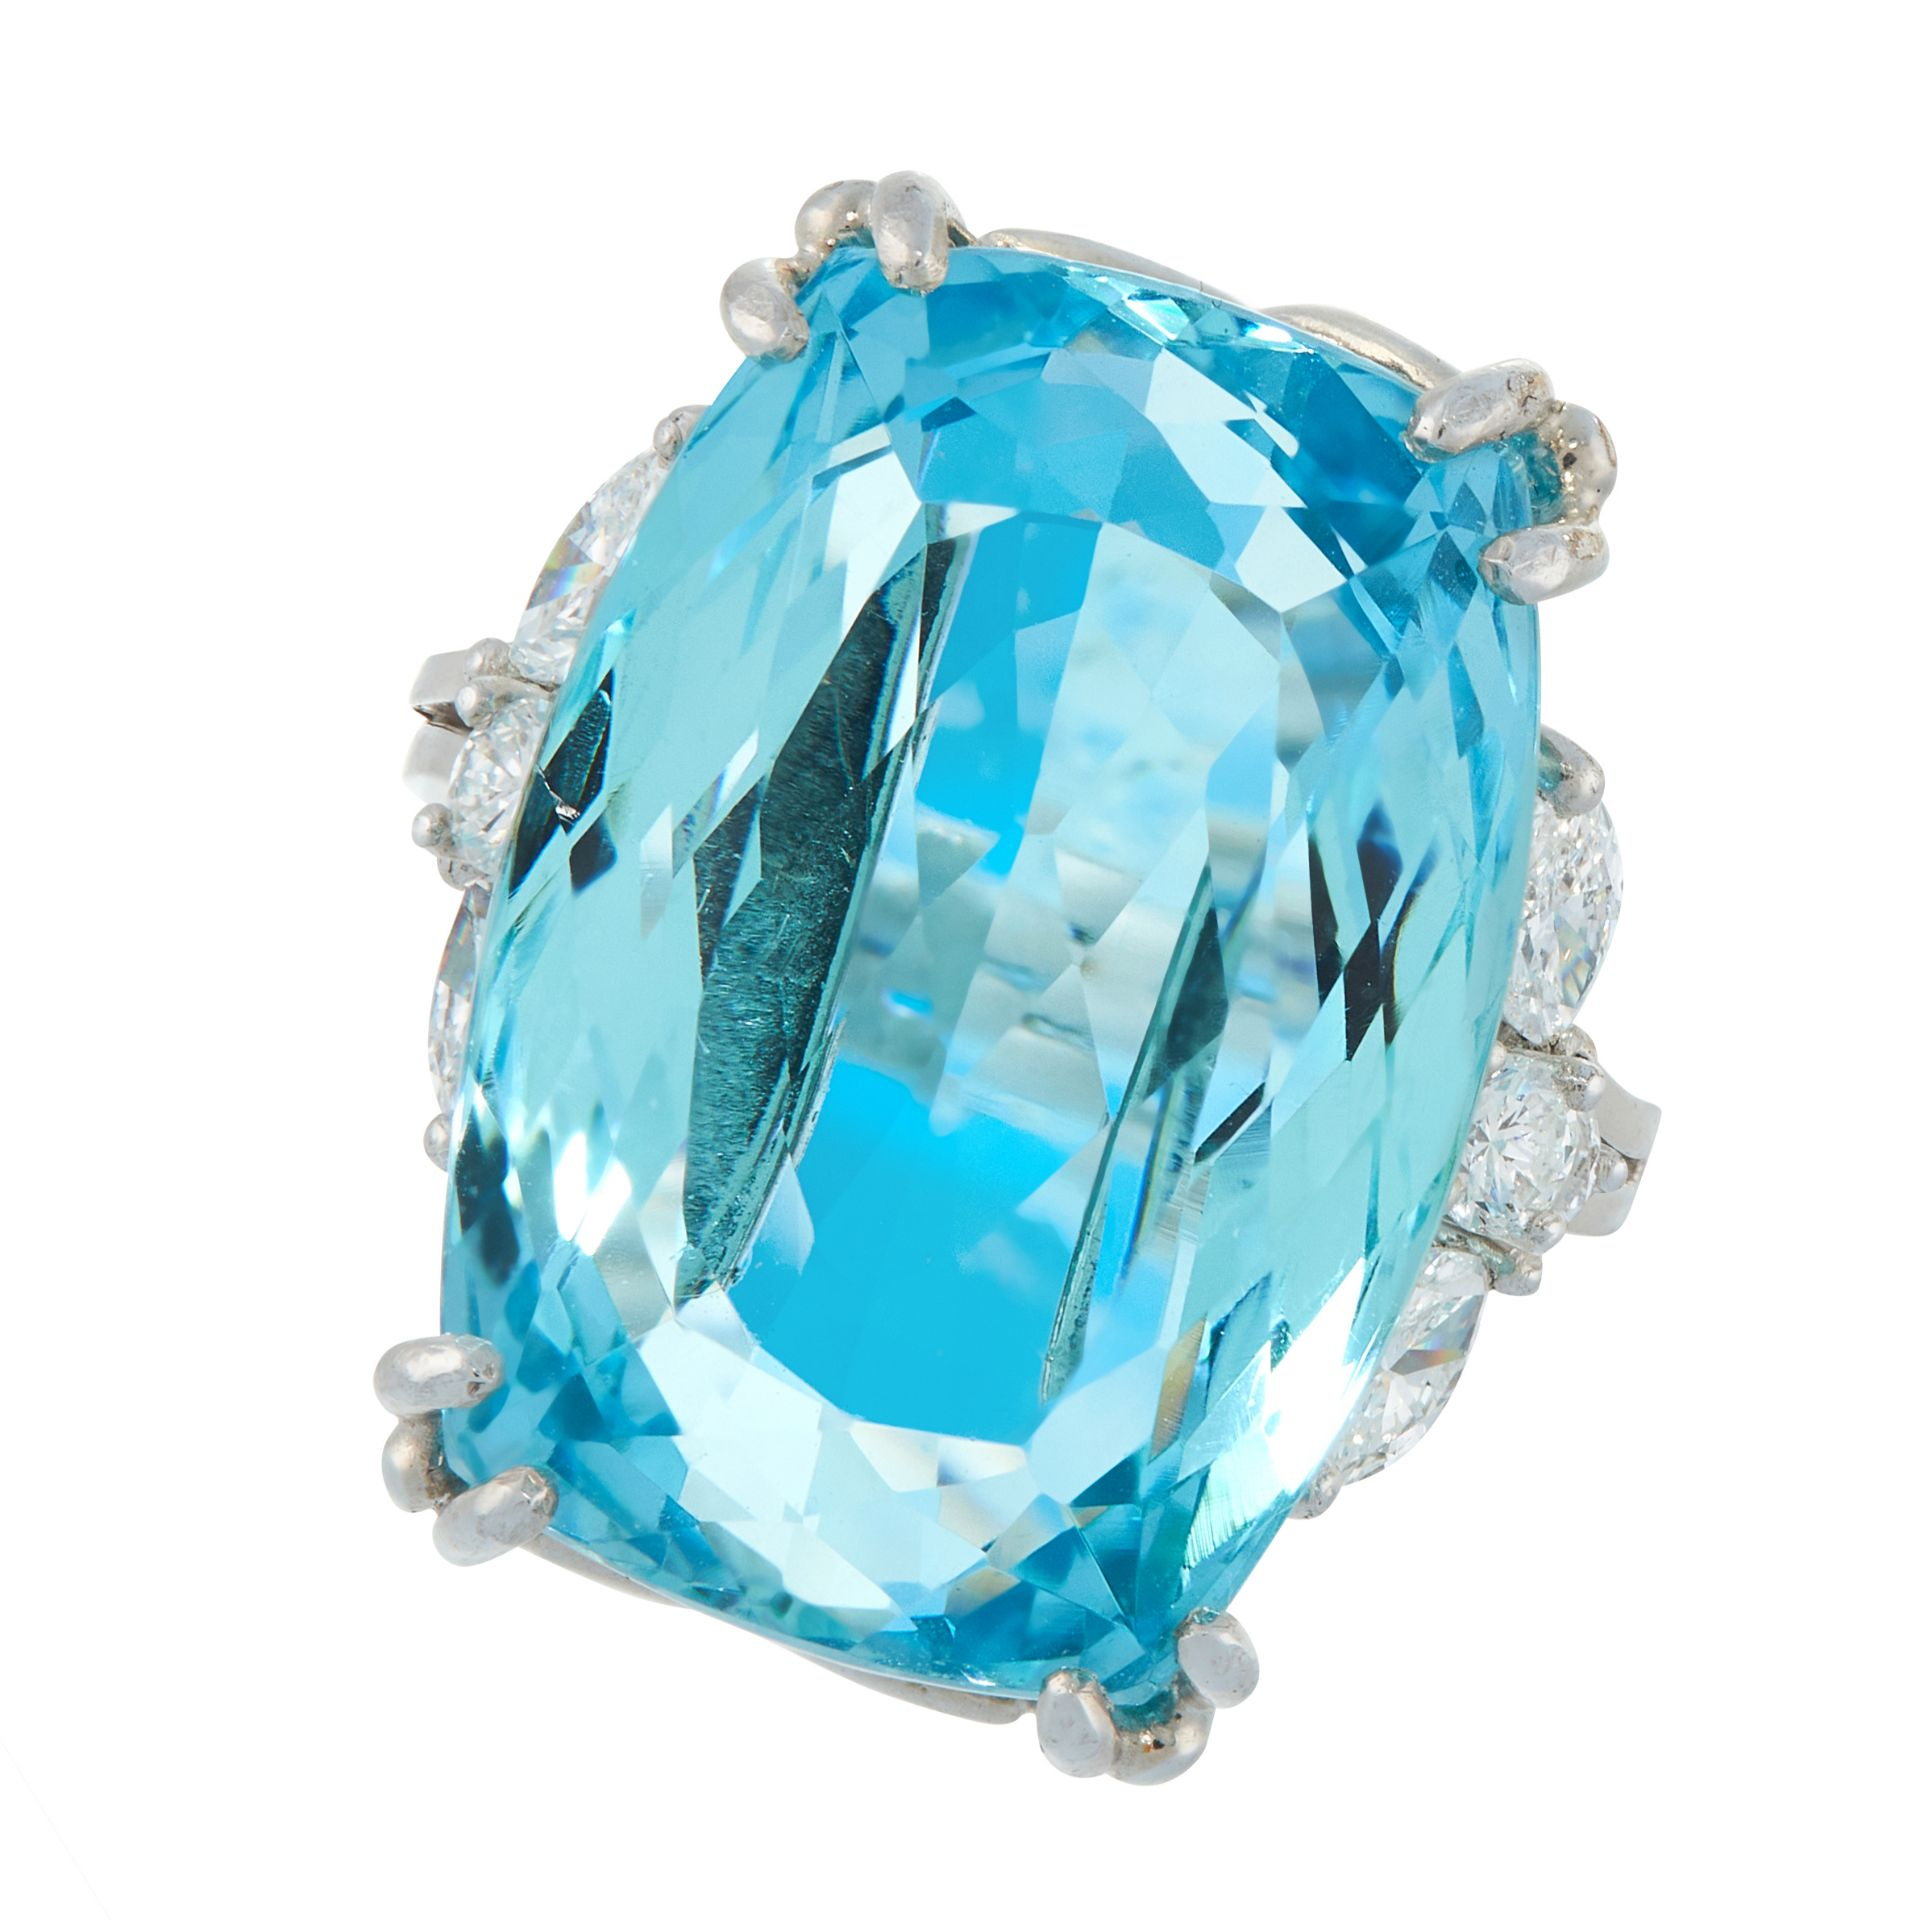 AN AQUAMARINE AND DIAMOND DRESS RING in platinum, set with a cushion cut aquamarine of 22.03 carats,